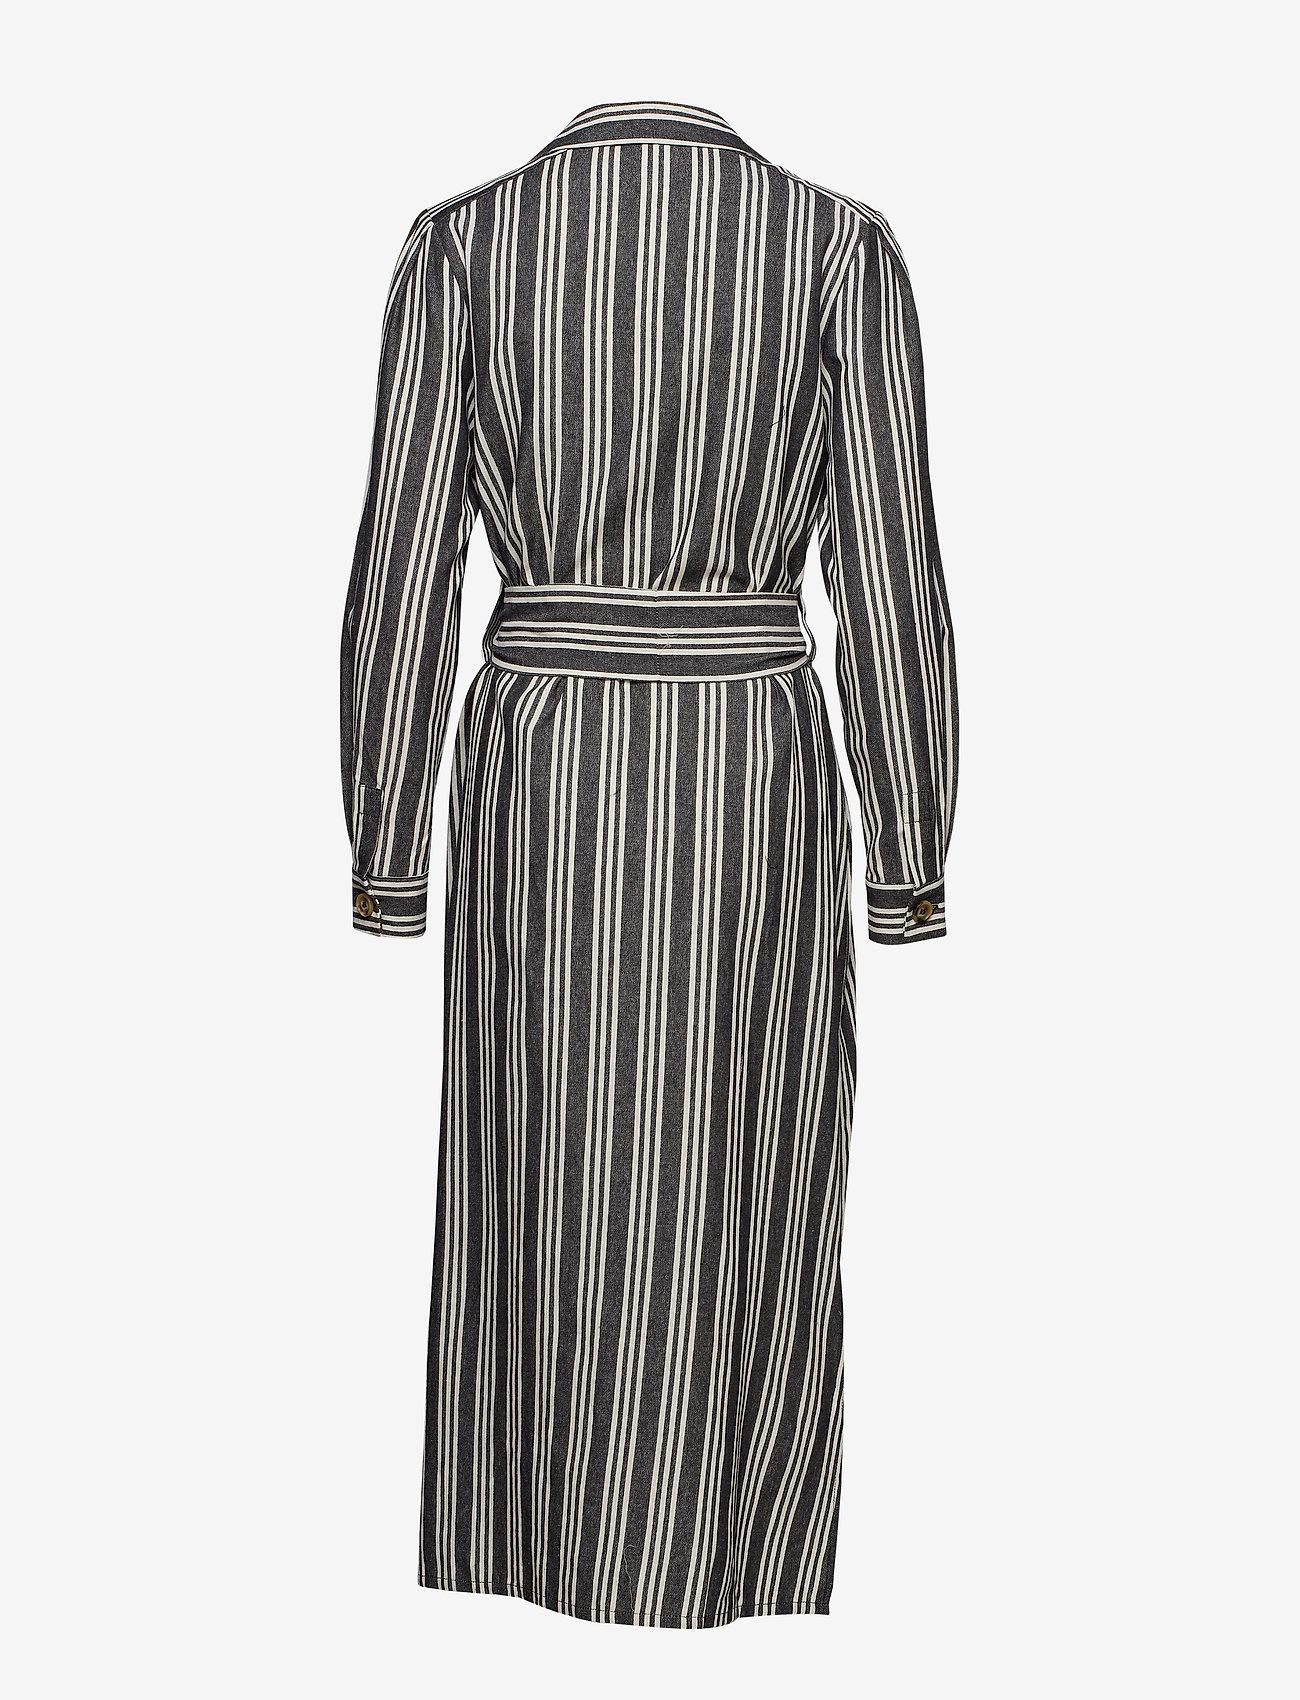 Olle Shirt Dress (Black) (150 €) - IBEN Ecbke